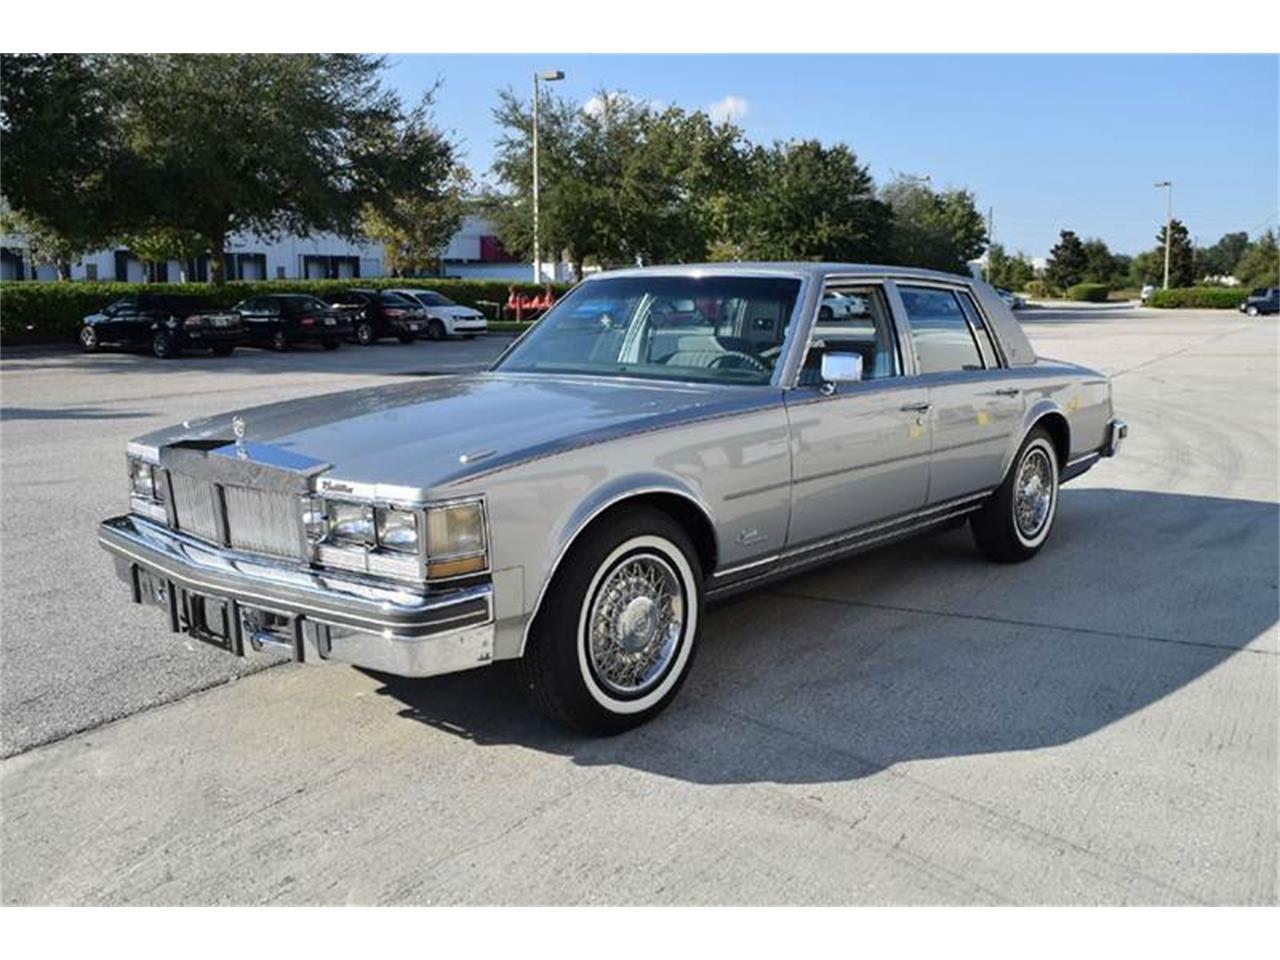 1976 Cadillac Seville For Sale Classiccars Com Cc 925642